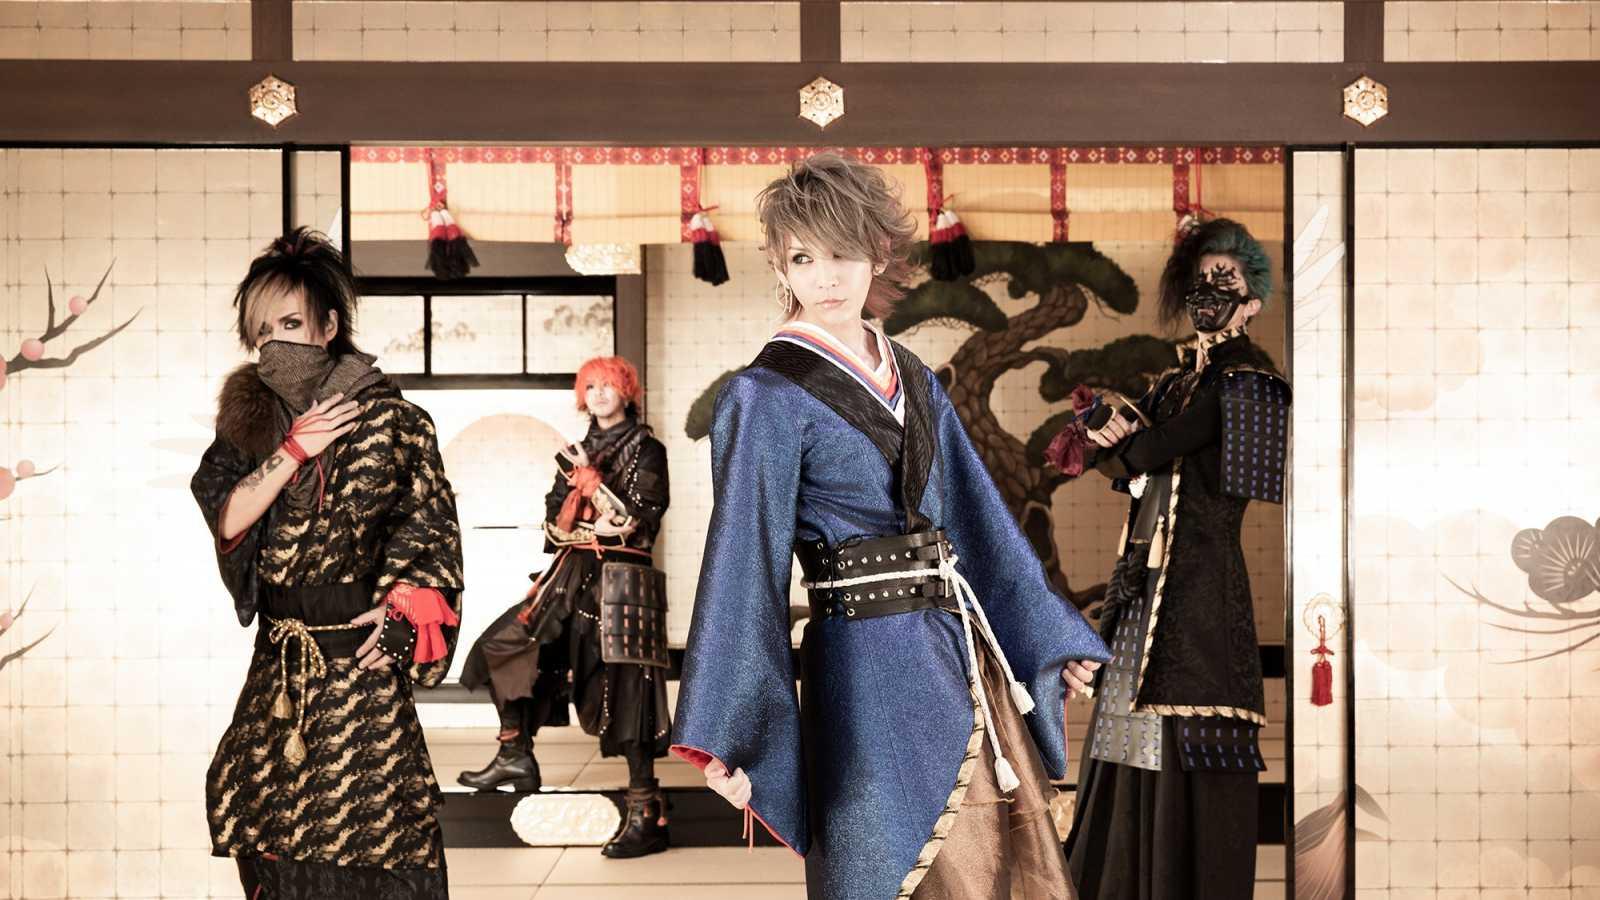 Nowy album Sengoku jidai -The age of civil wars- © Sengoku jidai -The age of civil wars- All rights reserved.